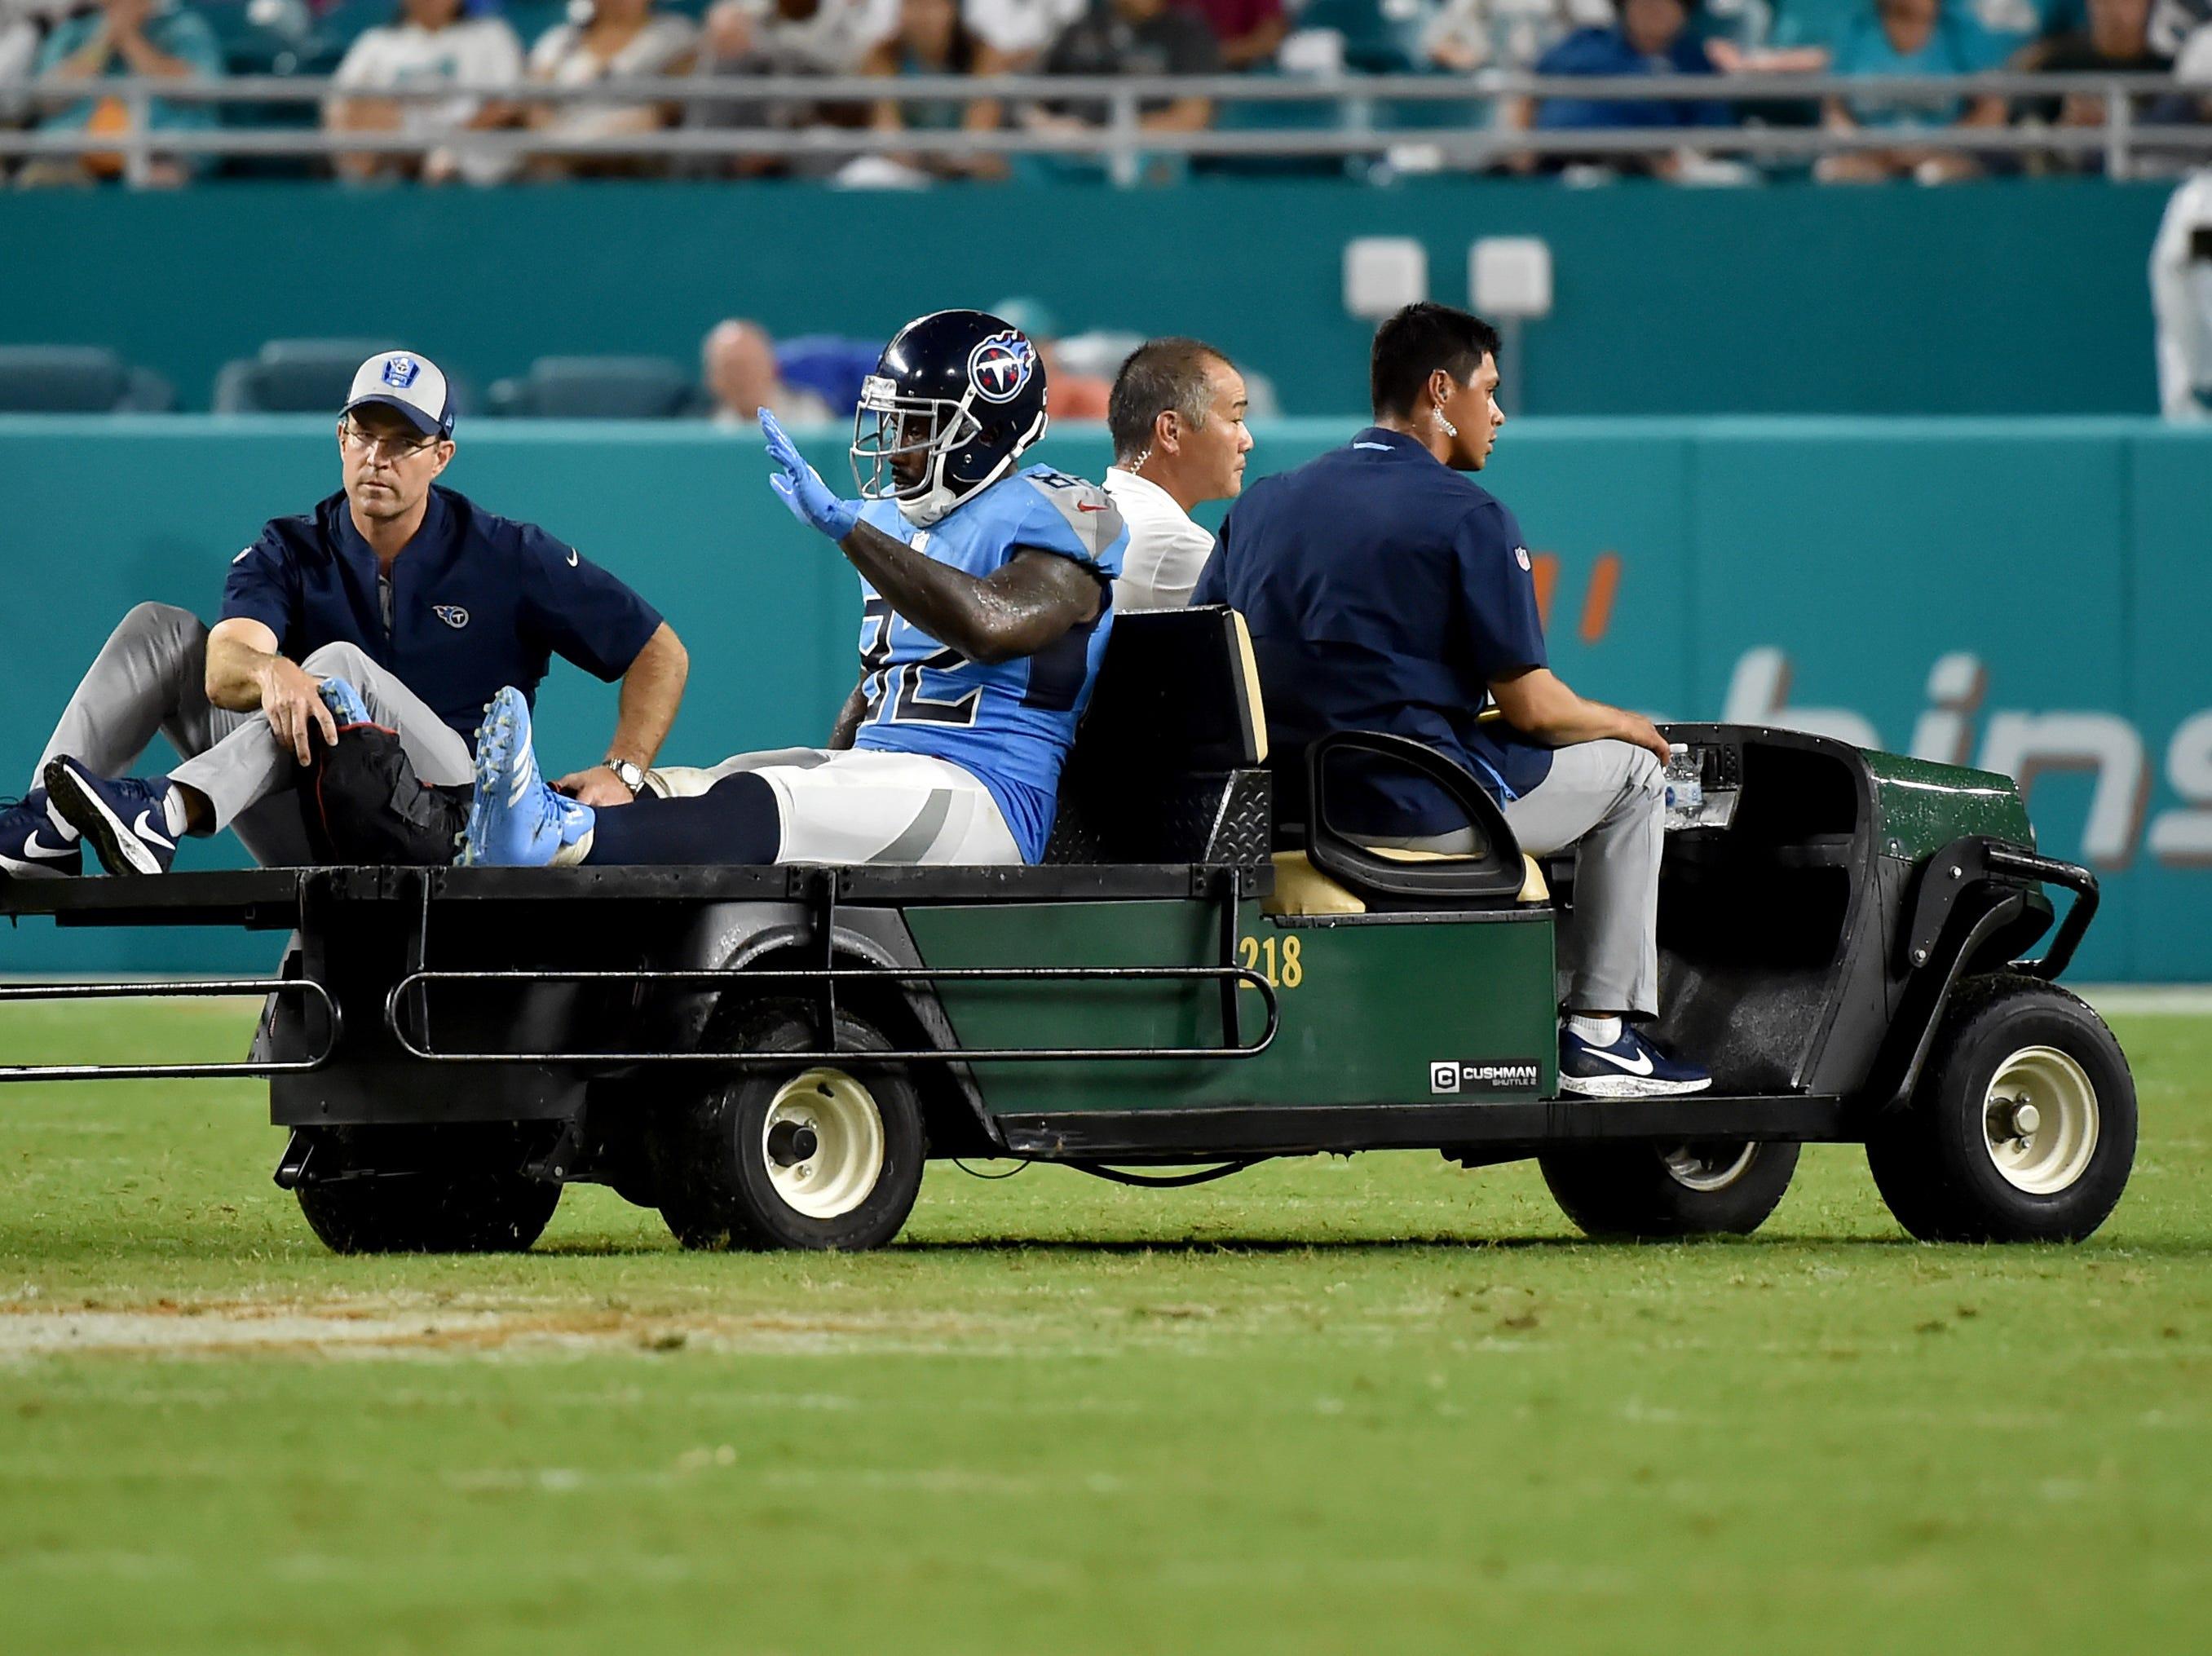 Delanie Walker, TE, Tennessee Titans (ankle injury, out until at least Week 10)